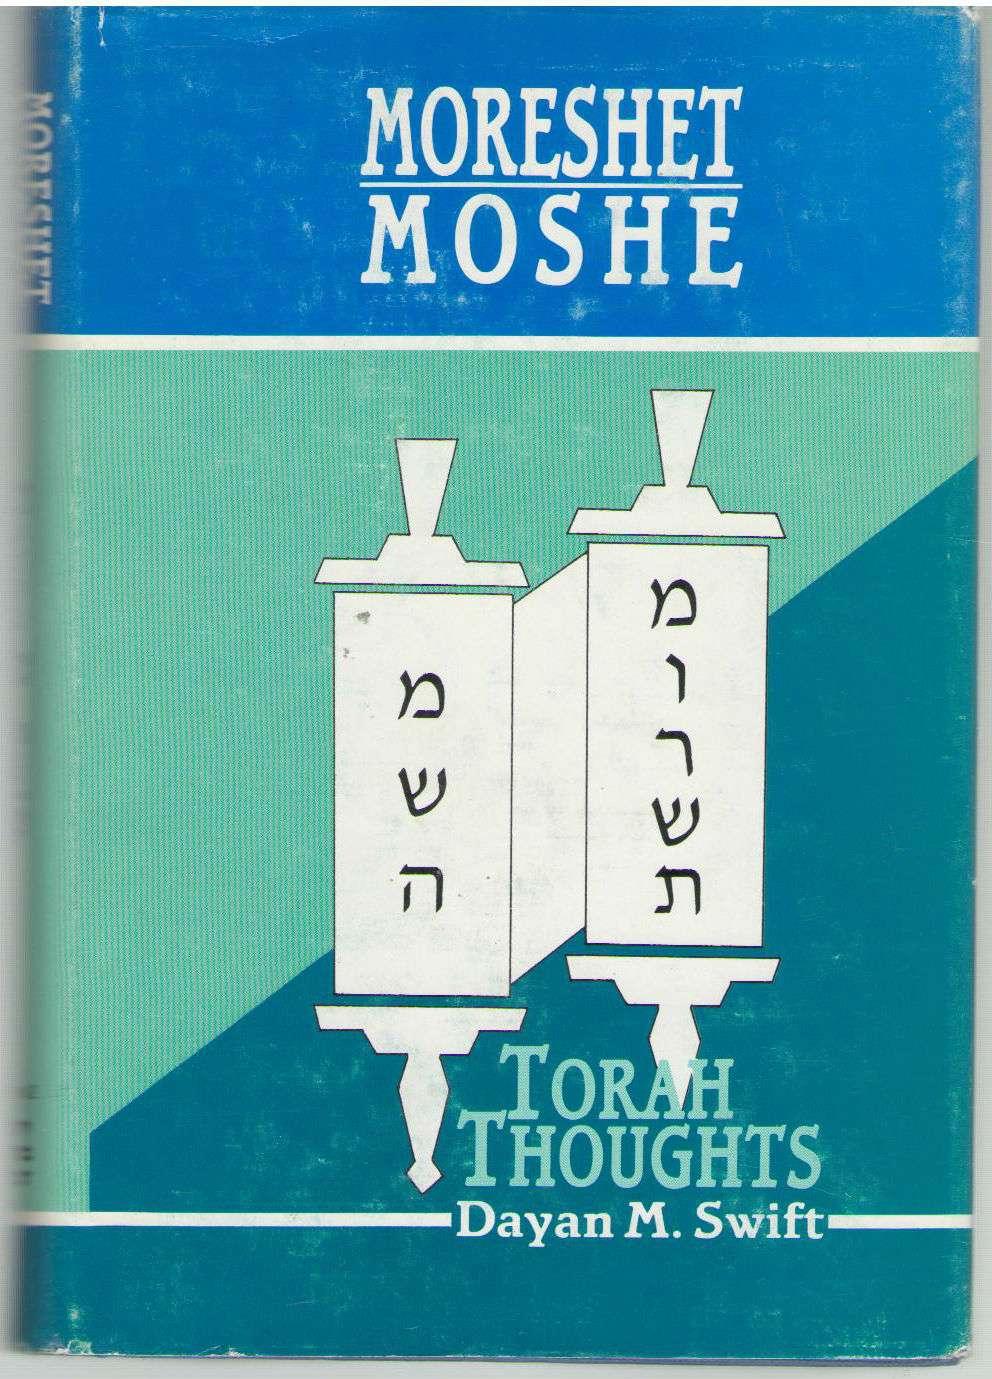 Moreshet Moshe Vol. 2: Torah Thoughts